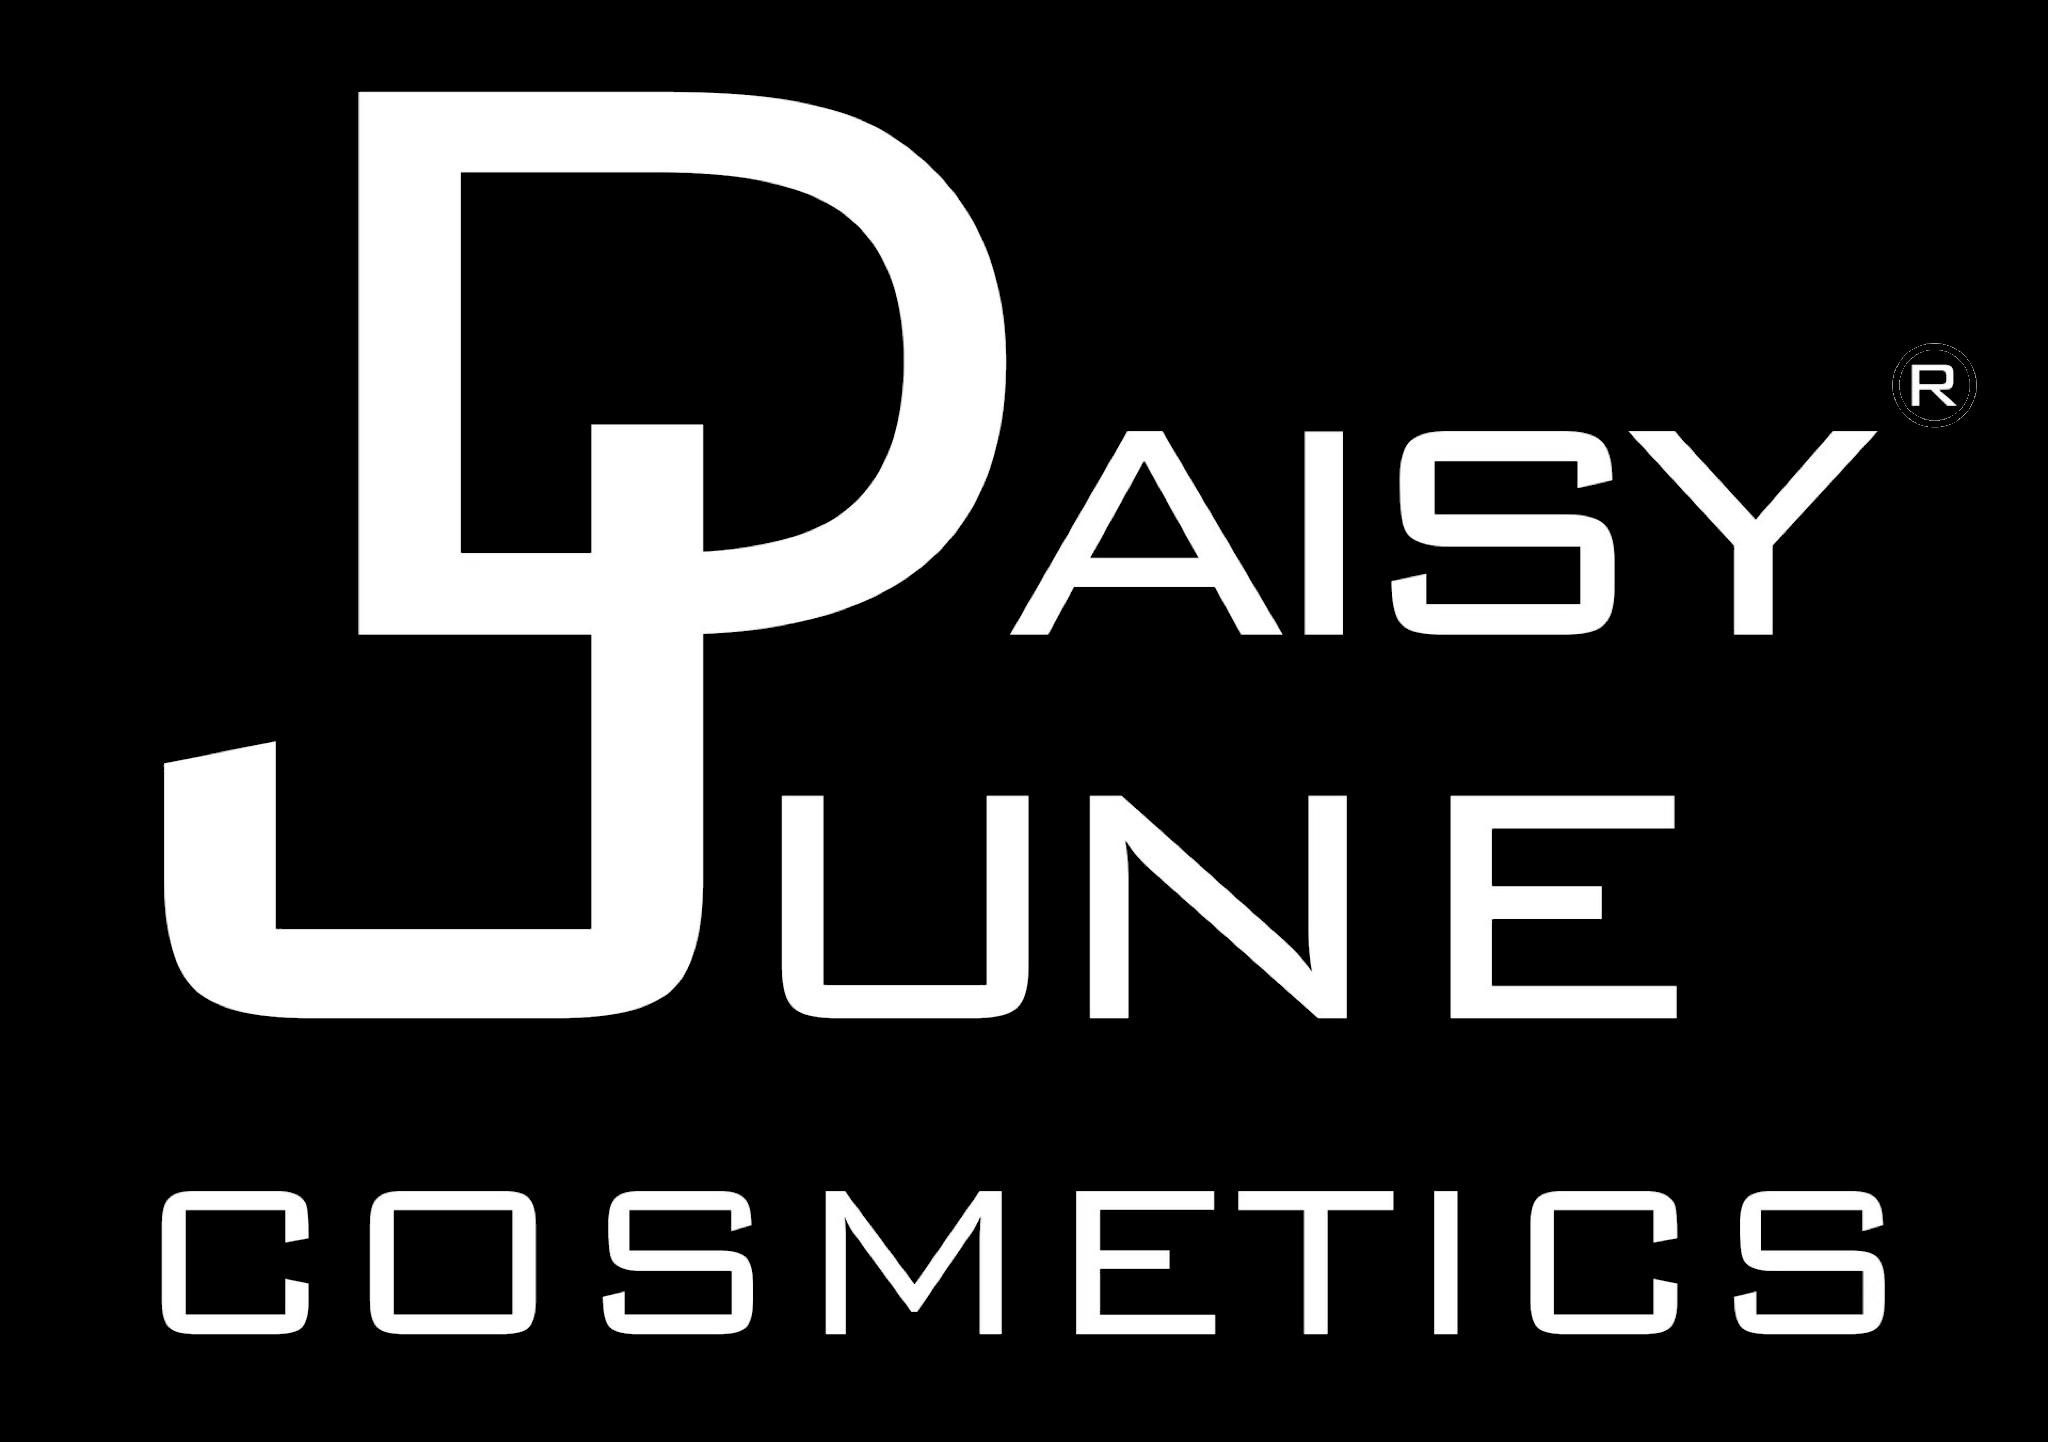 DaisyJune